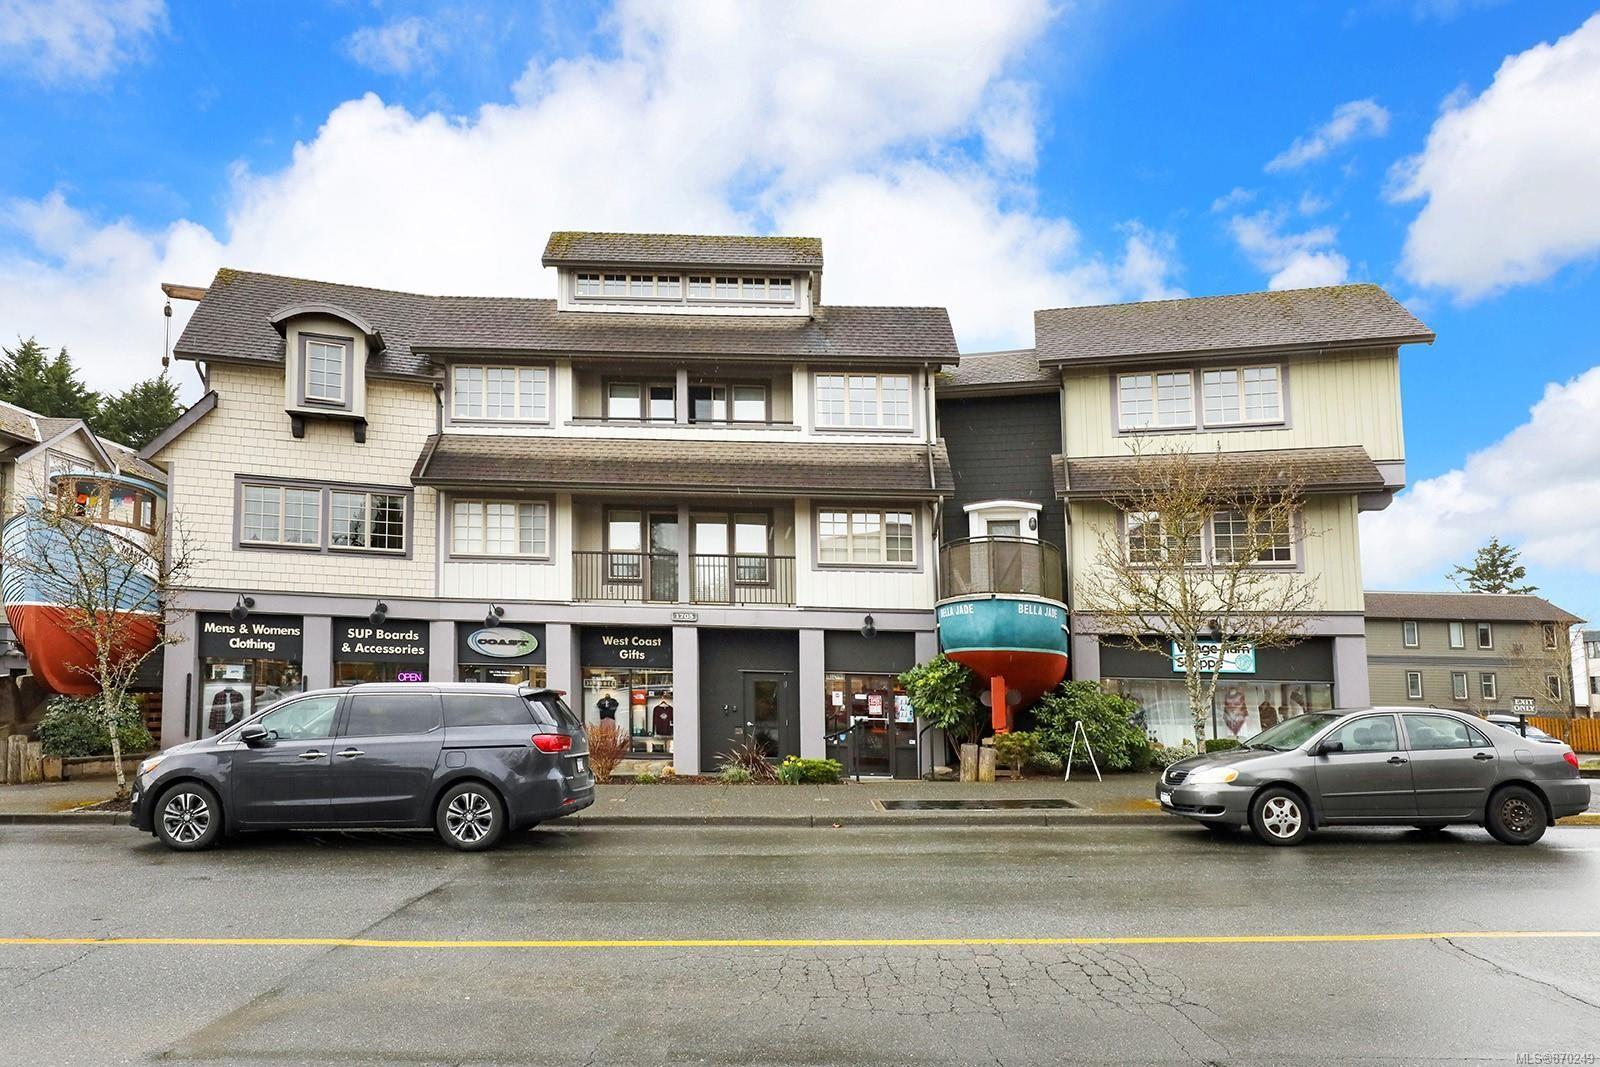 Main Photo: 304 1705 Comox Ave in Comox: CV Comox (Town of) Condo for sale (Comox Valley)  : MLS®# 870249